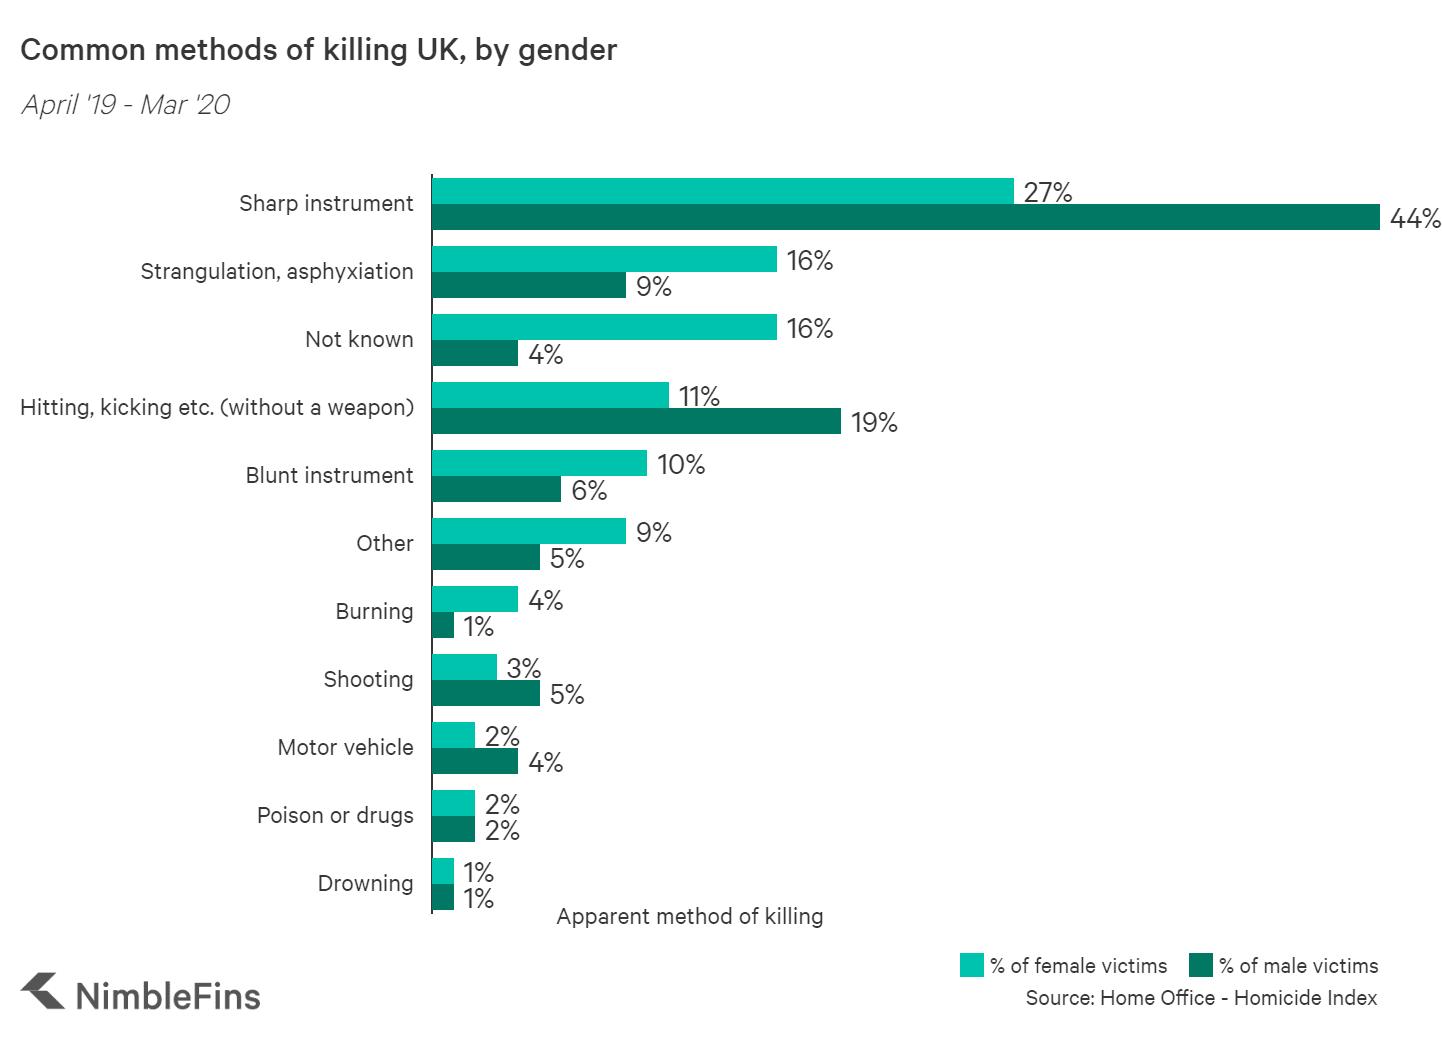 Methods of killing, by gender UK